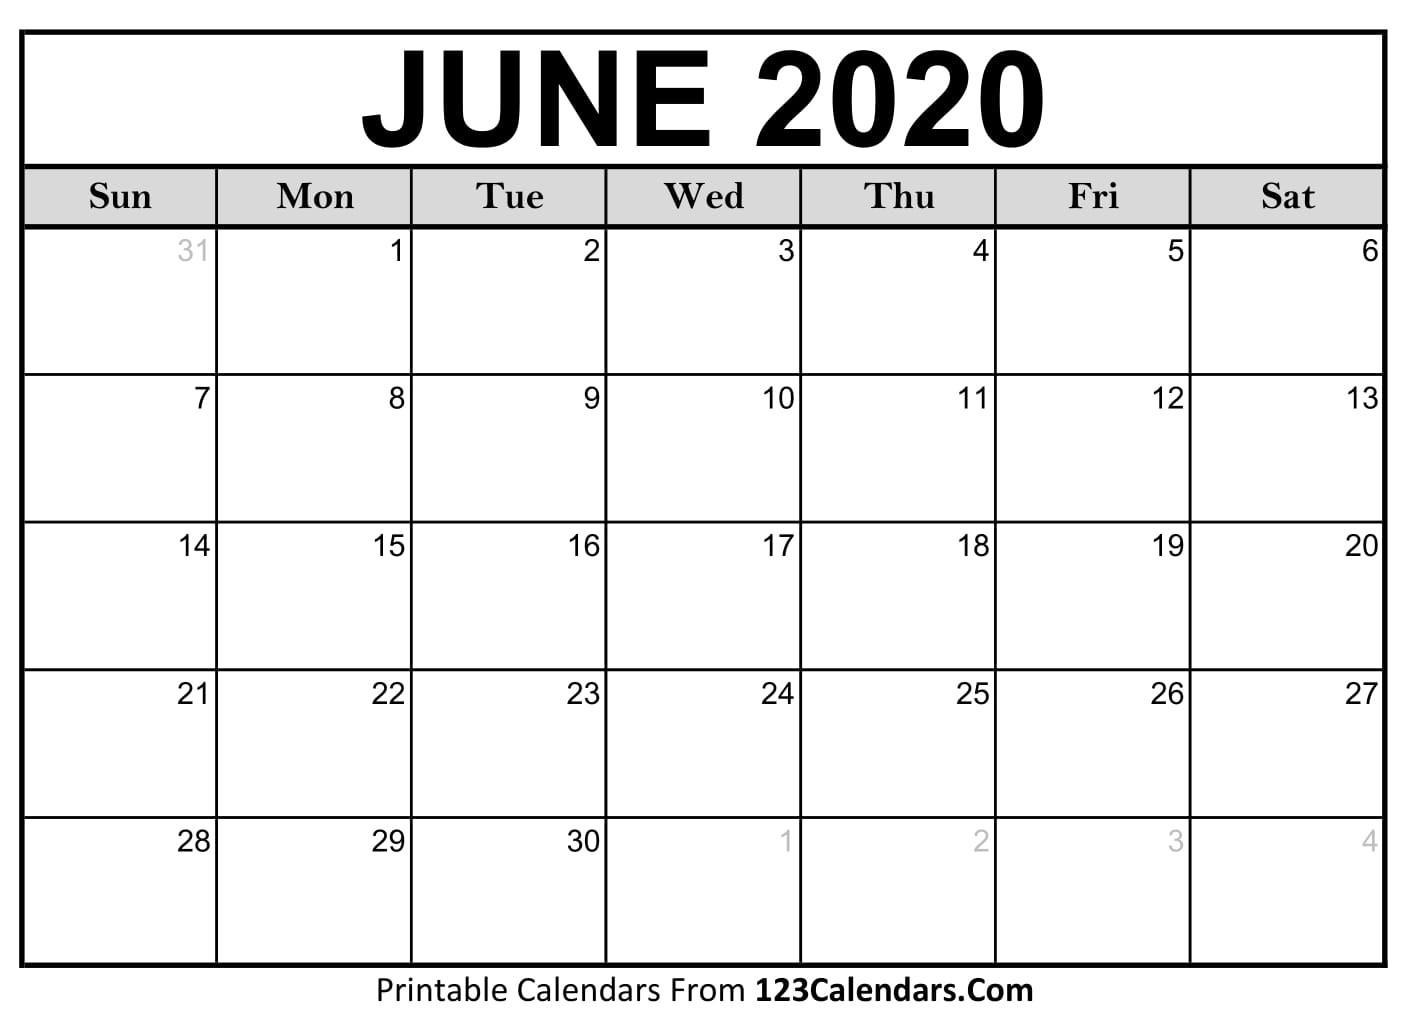 June 2020 Printable Calendar | 123Calendars-Printable Monthly Calendar June 2020